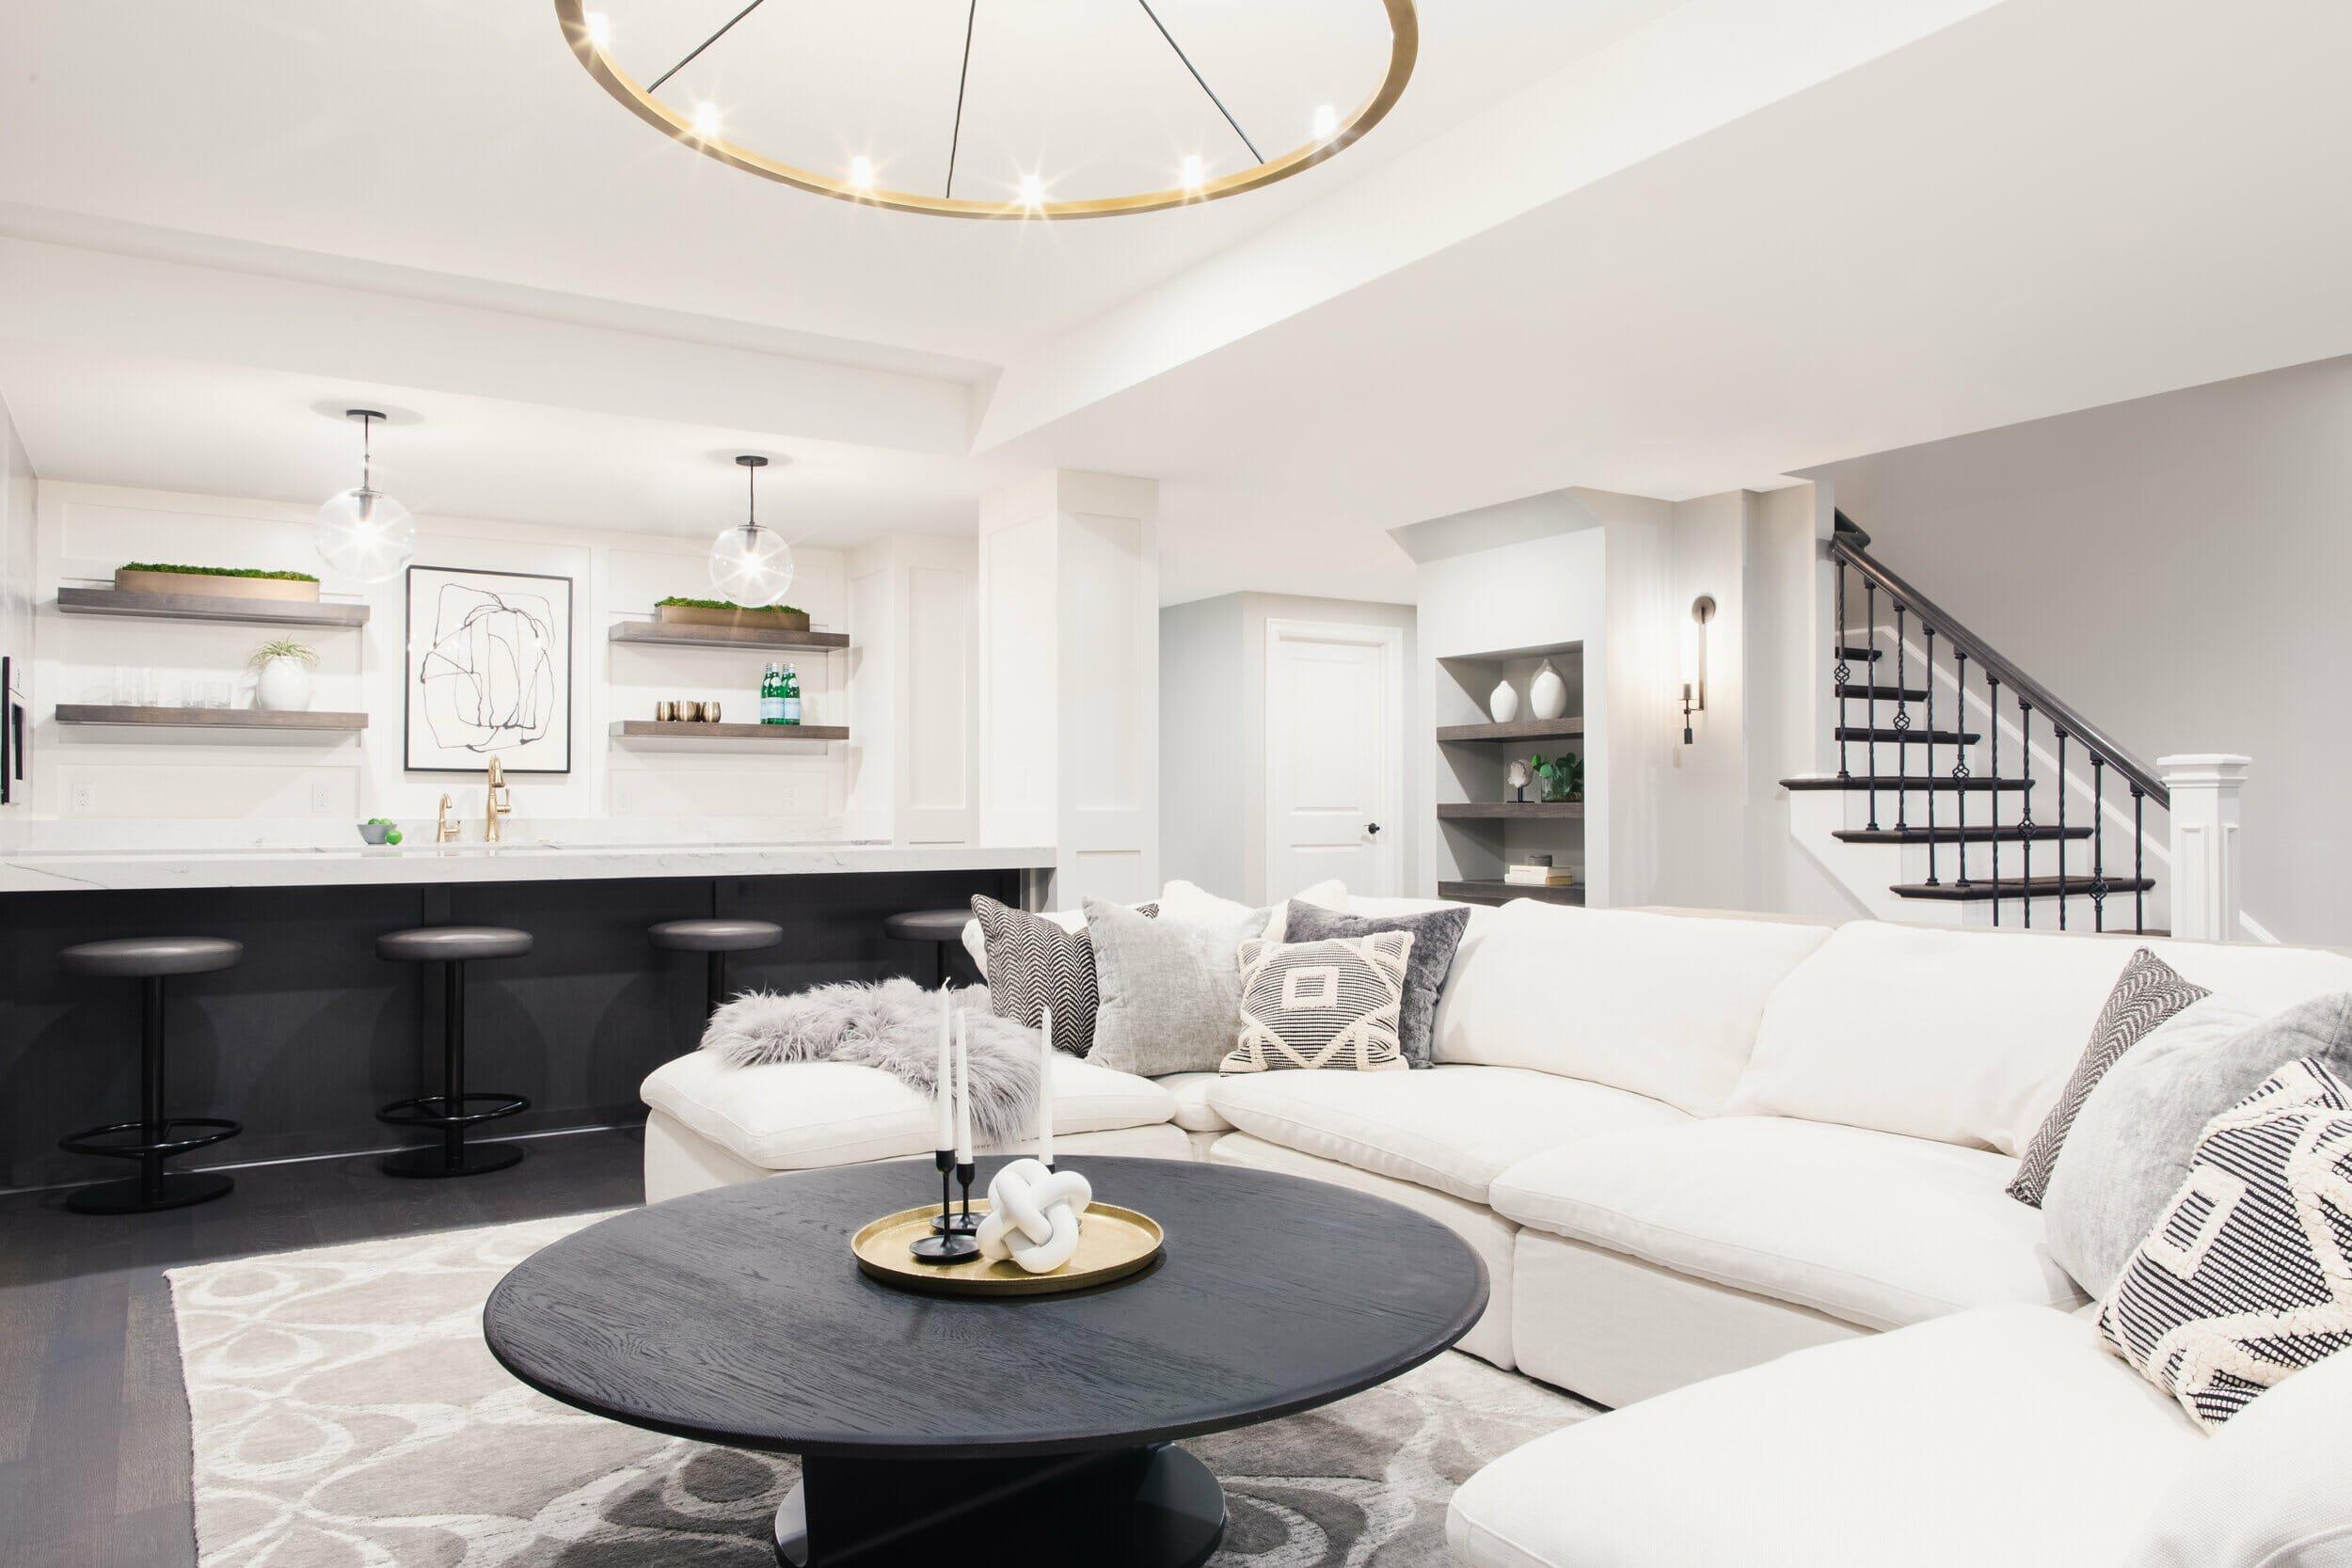 Top interior design firms Detroit Lisa Backus